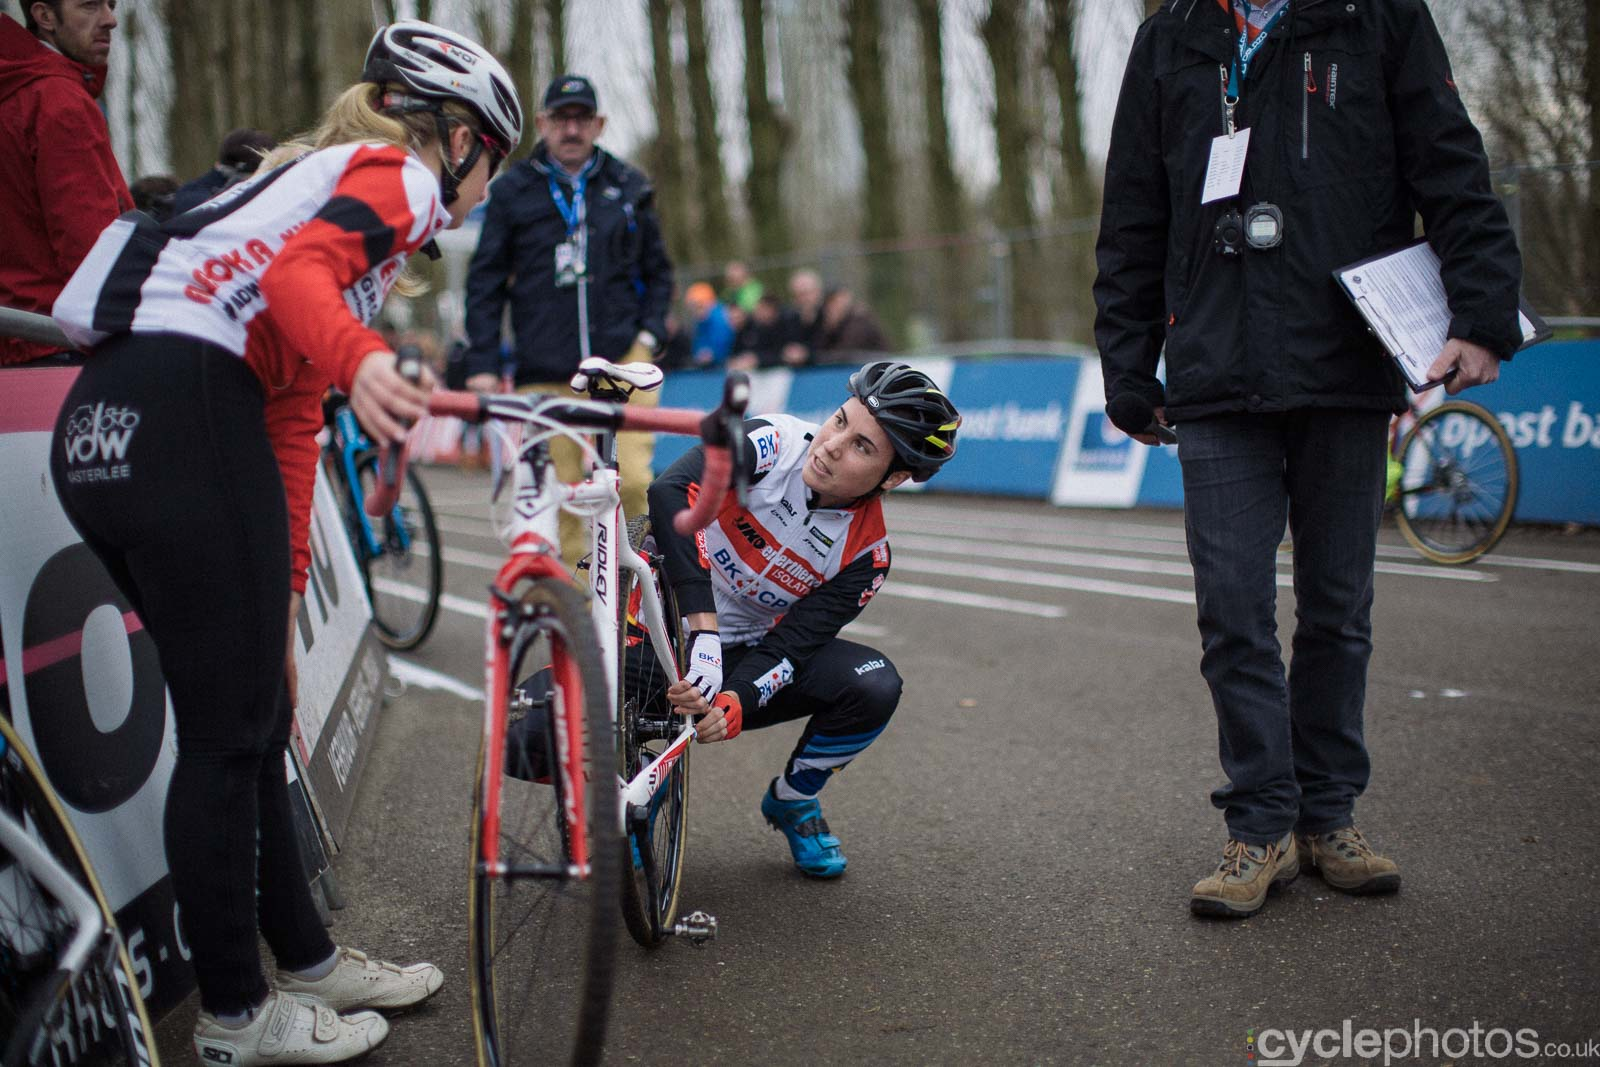 2015-cyclephotos-cyclocross-scheldecross-133322-sanne-cant